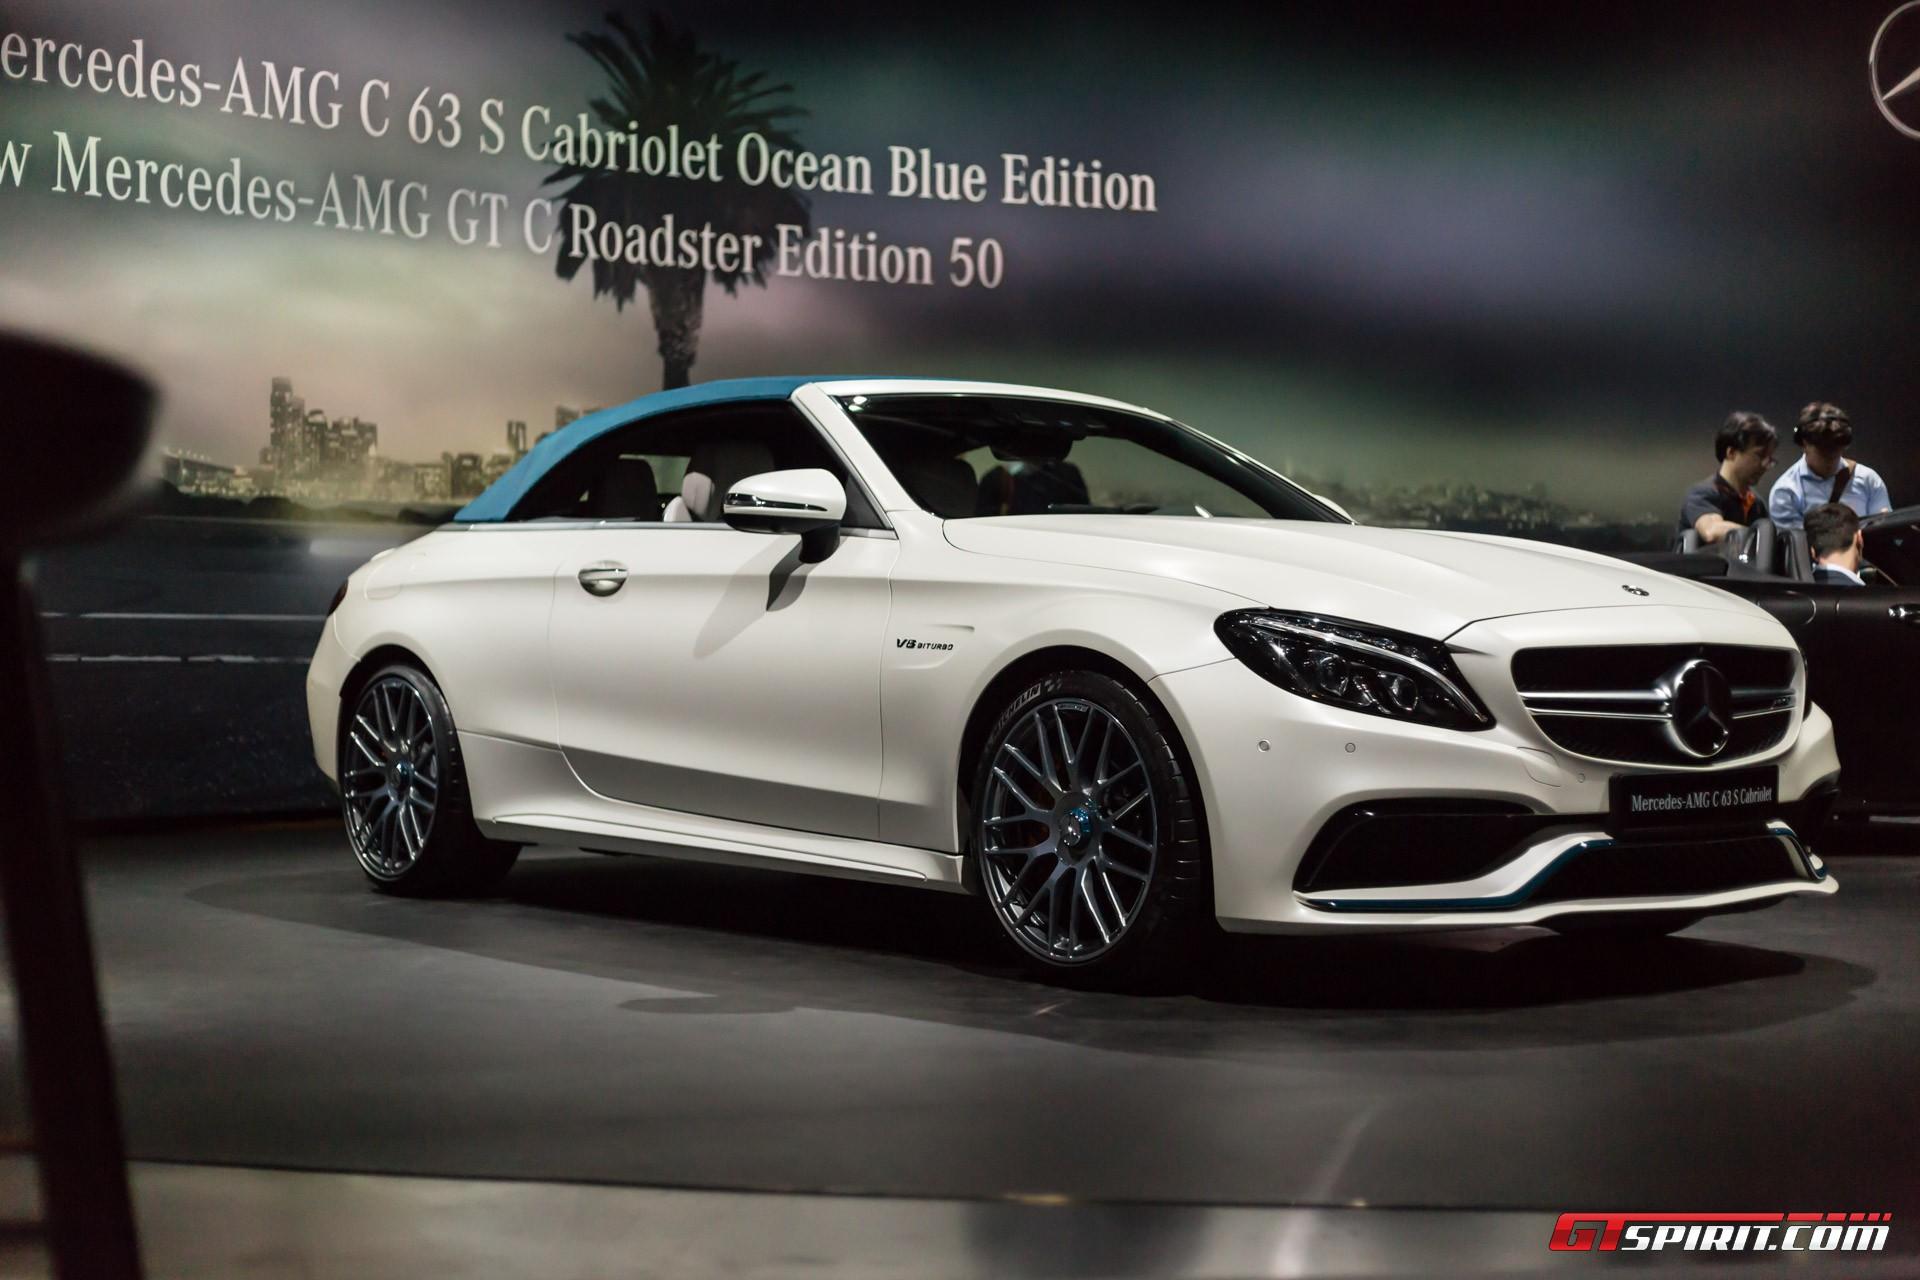 https://storage.googleapis.com/gtspirit/uploads/2017/03/Mercedes-Benz_Geneva_2017-7.jpg